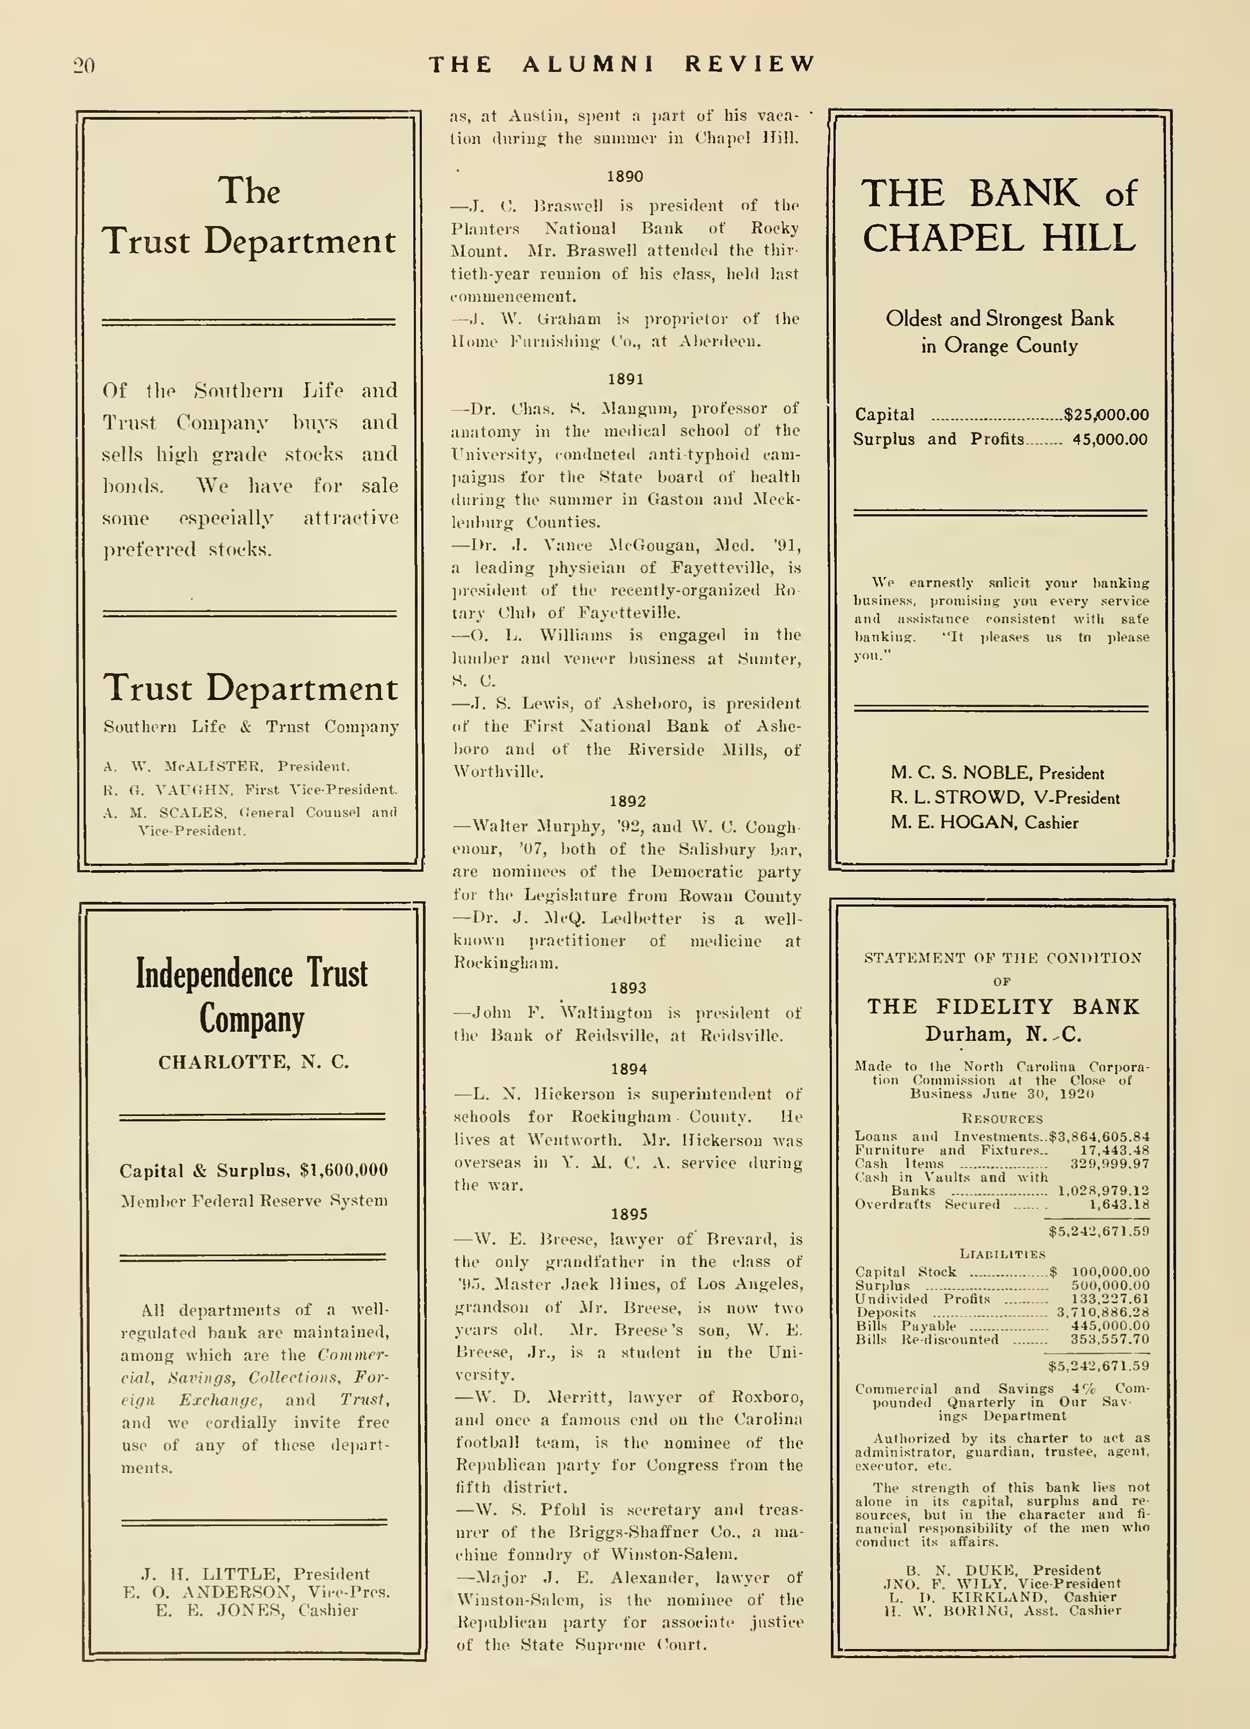 Carolina Alumni Review - October 1920 - page 19